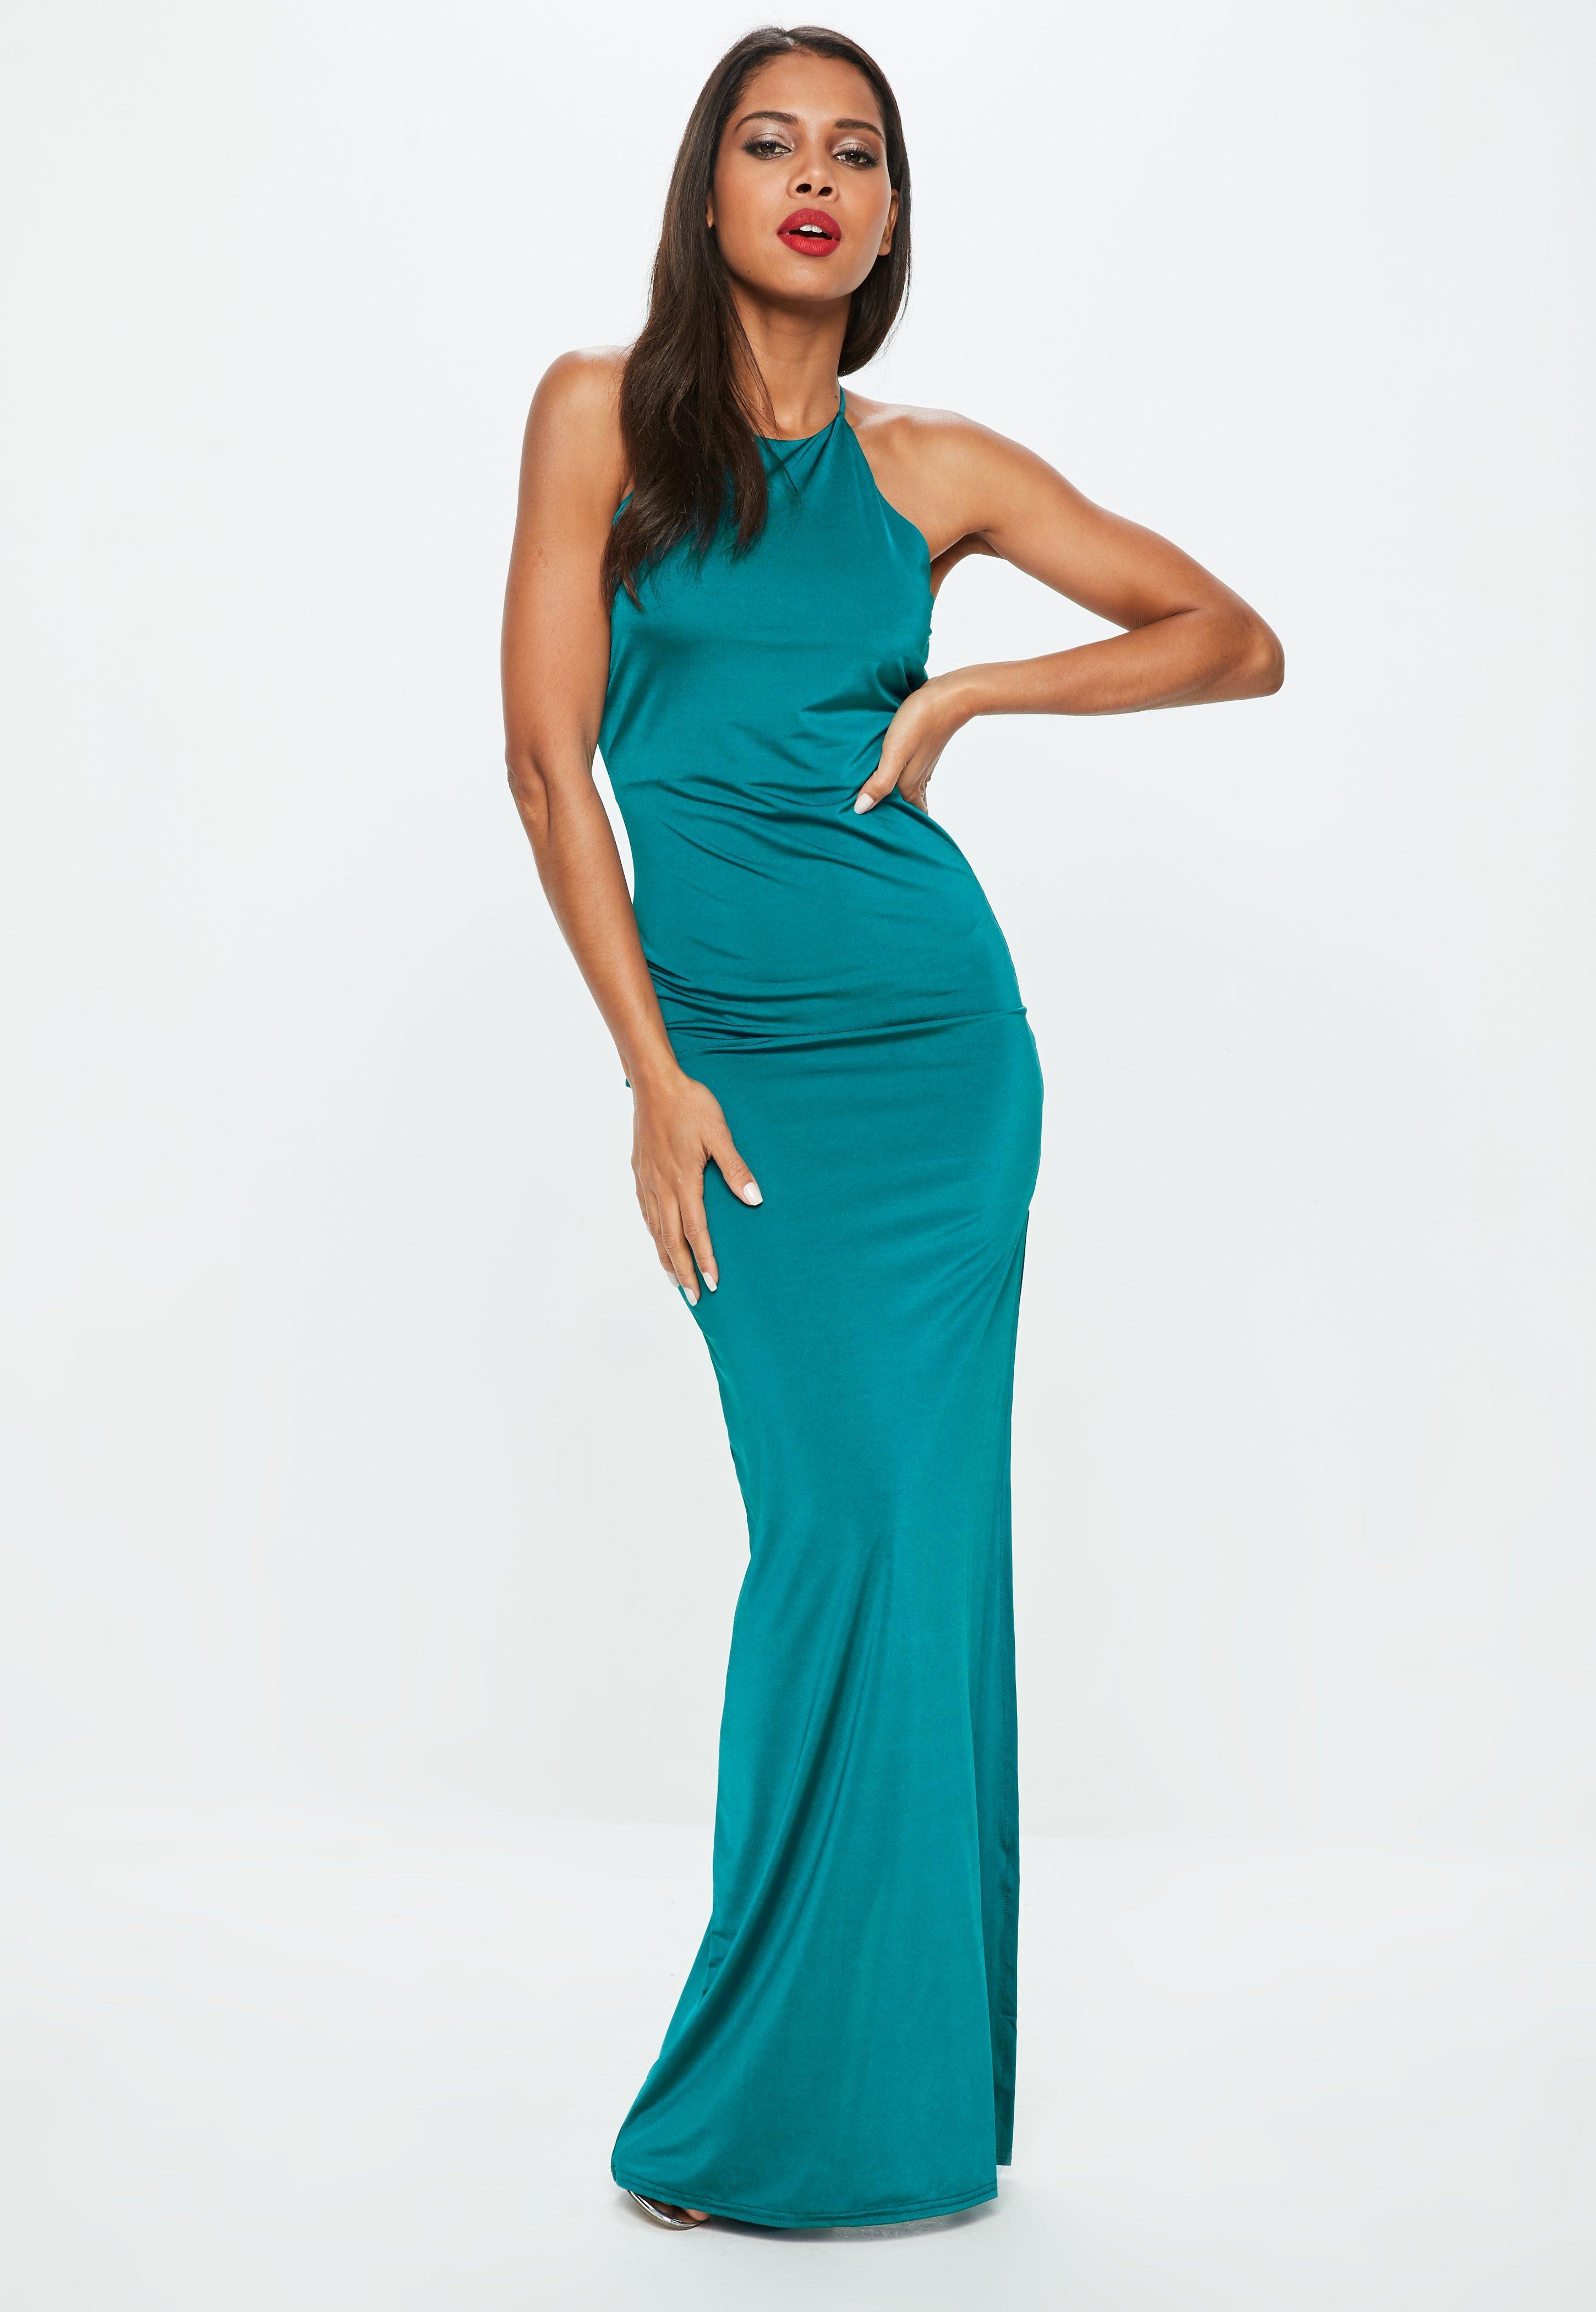 7e1b42bcb2 Missguided Teal Slinky Maxi Dress in Blue - Lyst